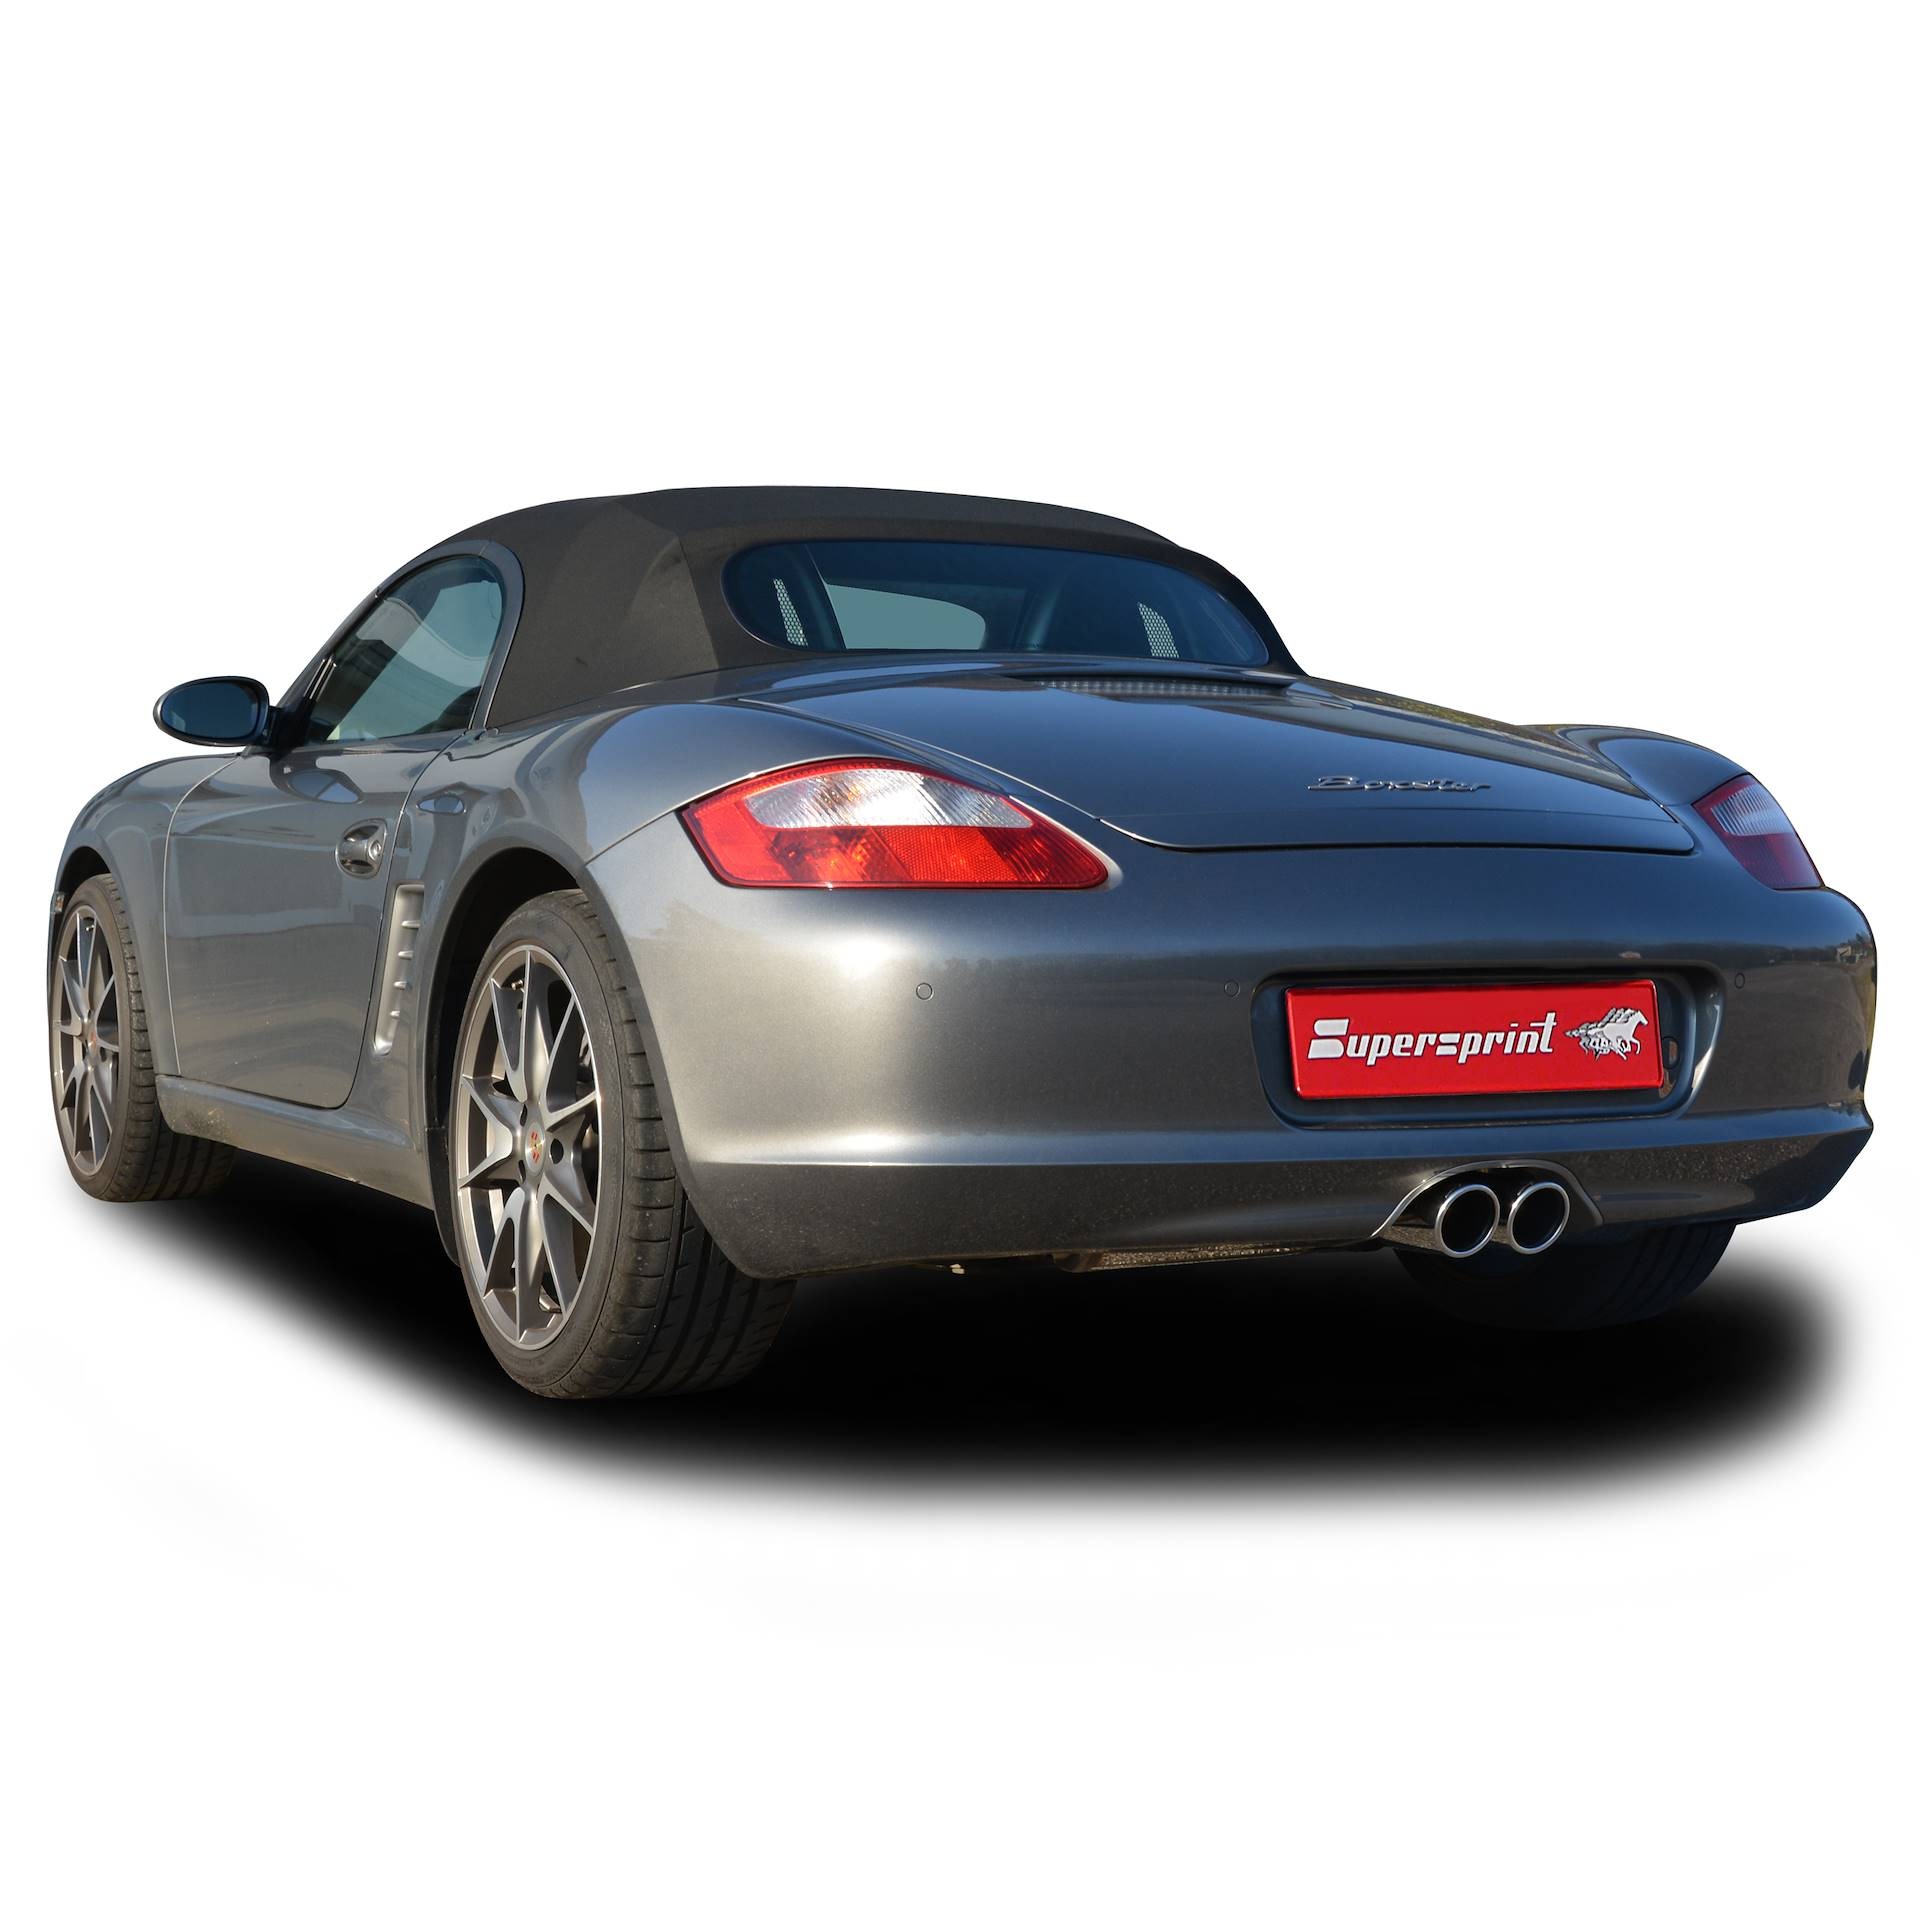 Performance Sport Exhaust For Porsche Boxster 987 2 7i